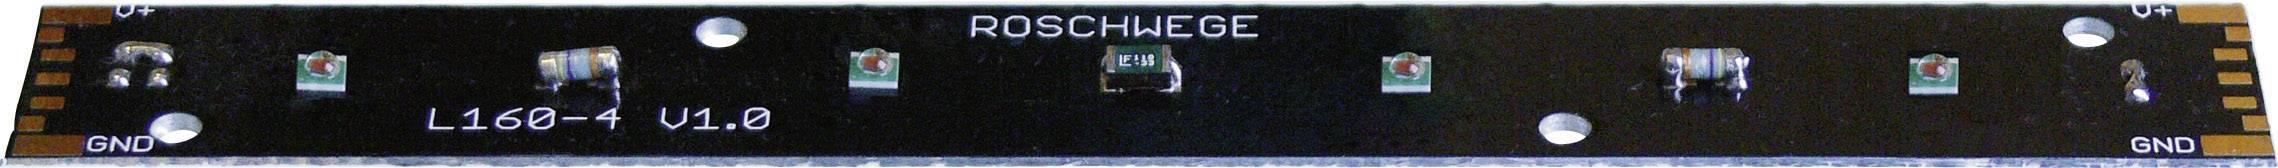 HighPower LED-lišta Roschwege 400 lm, neutrálne biela